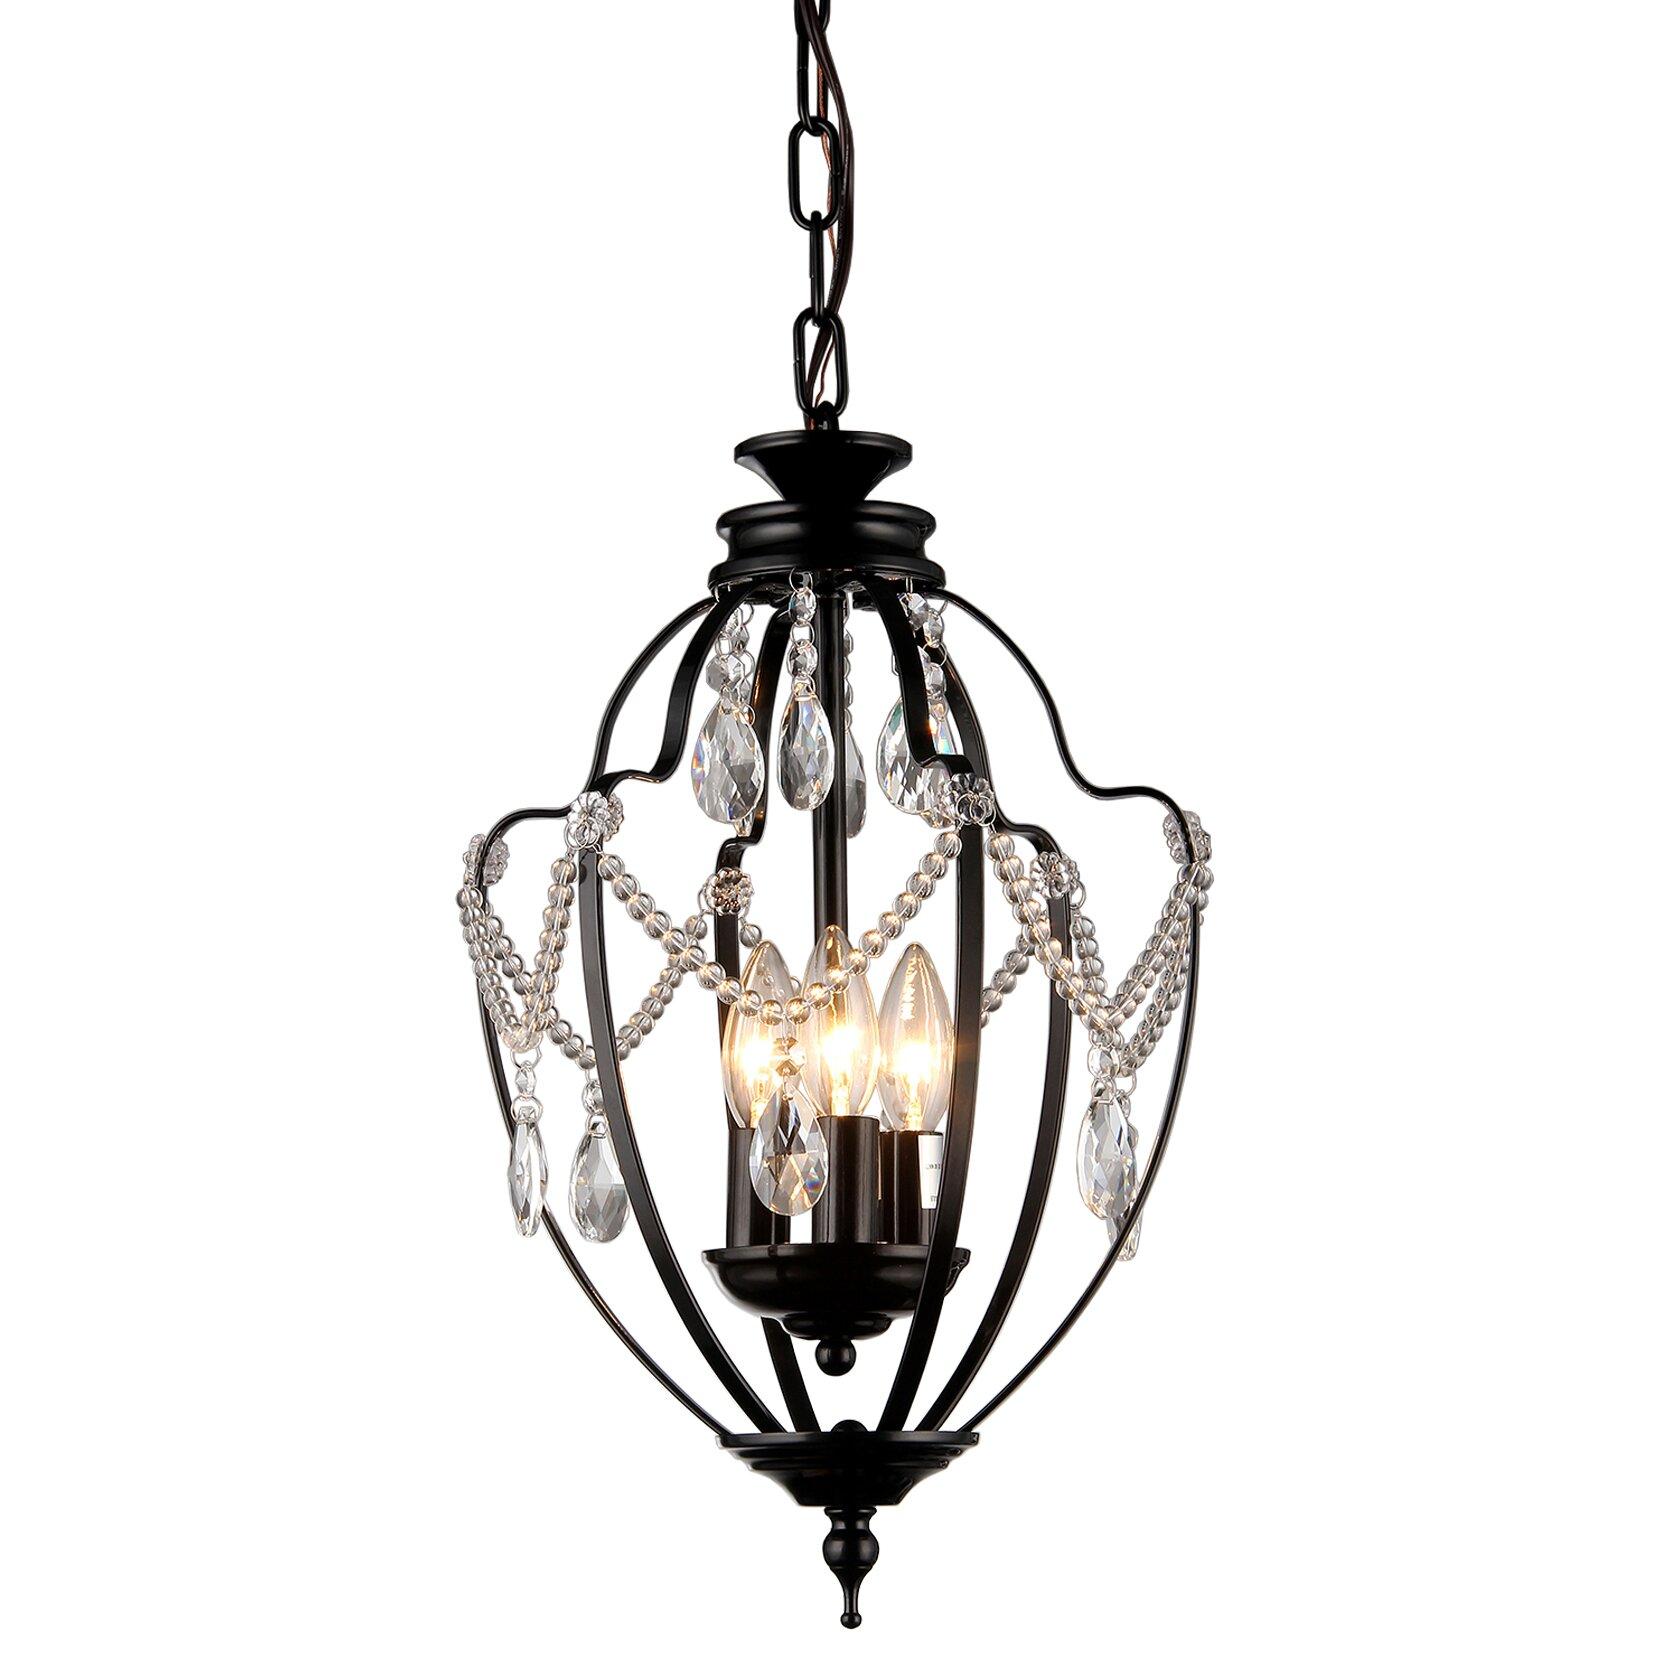 Foyer Lighting Tiffany Style : Warehouse of tiffany kennedy light candle style